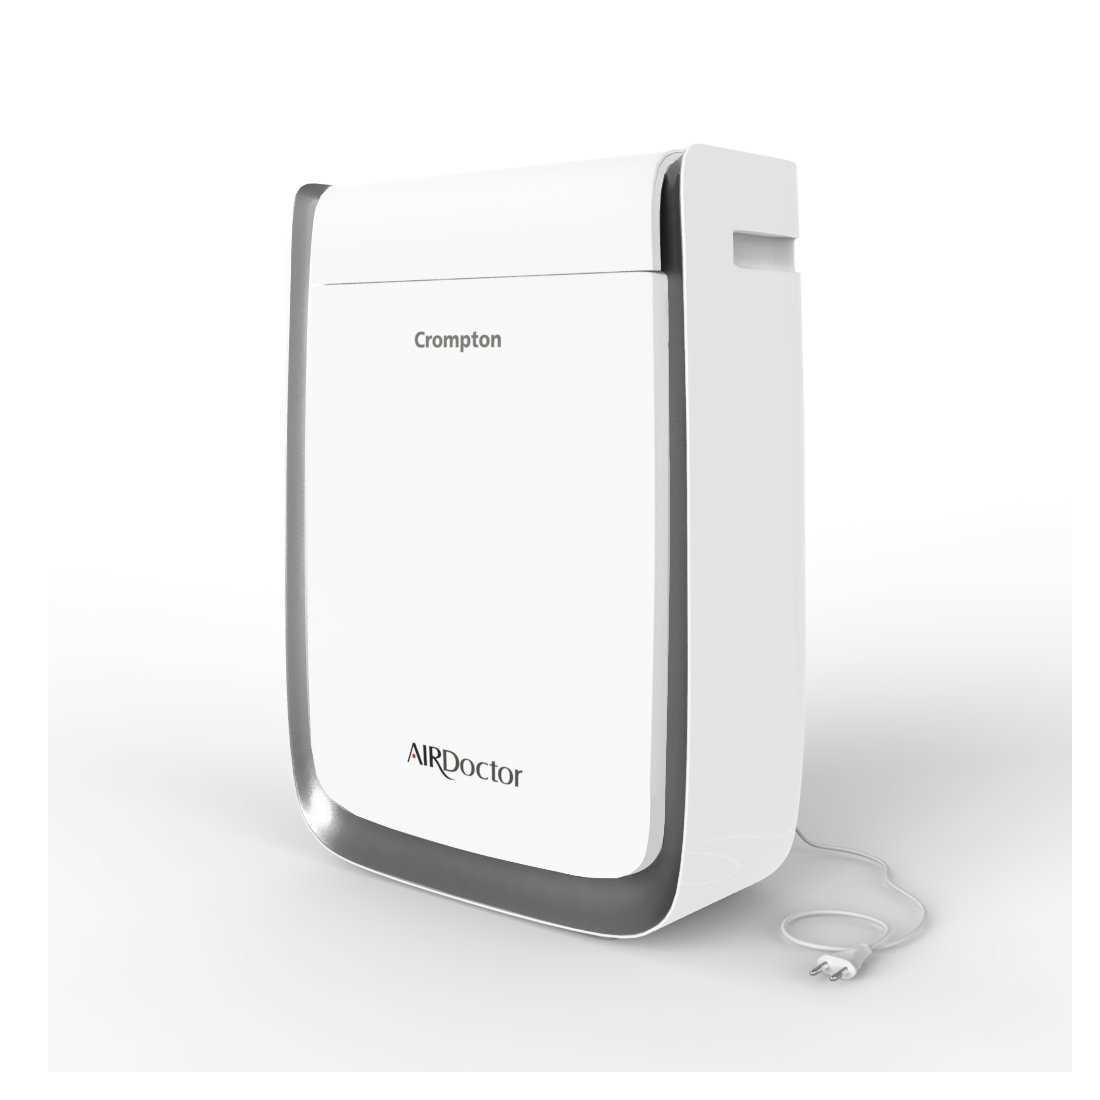 Crompton Air Doctor Air Purifier